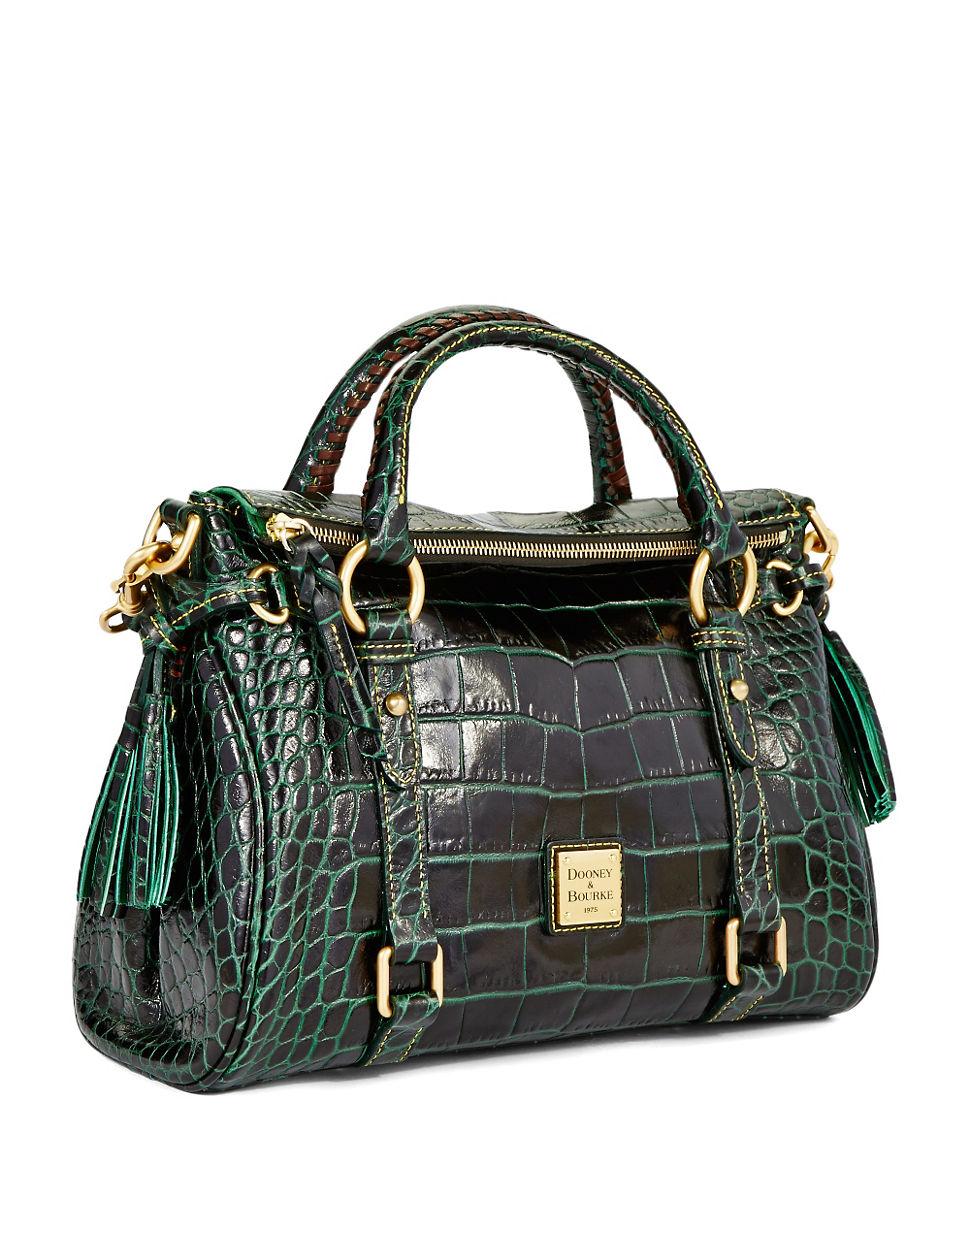 Dooney Amp Bourke Croc Embossed Small Leather Satchel Bag In